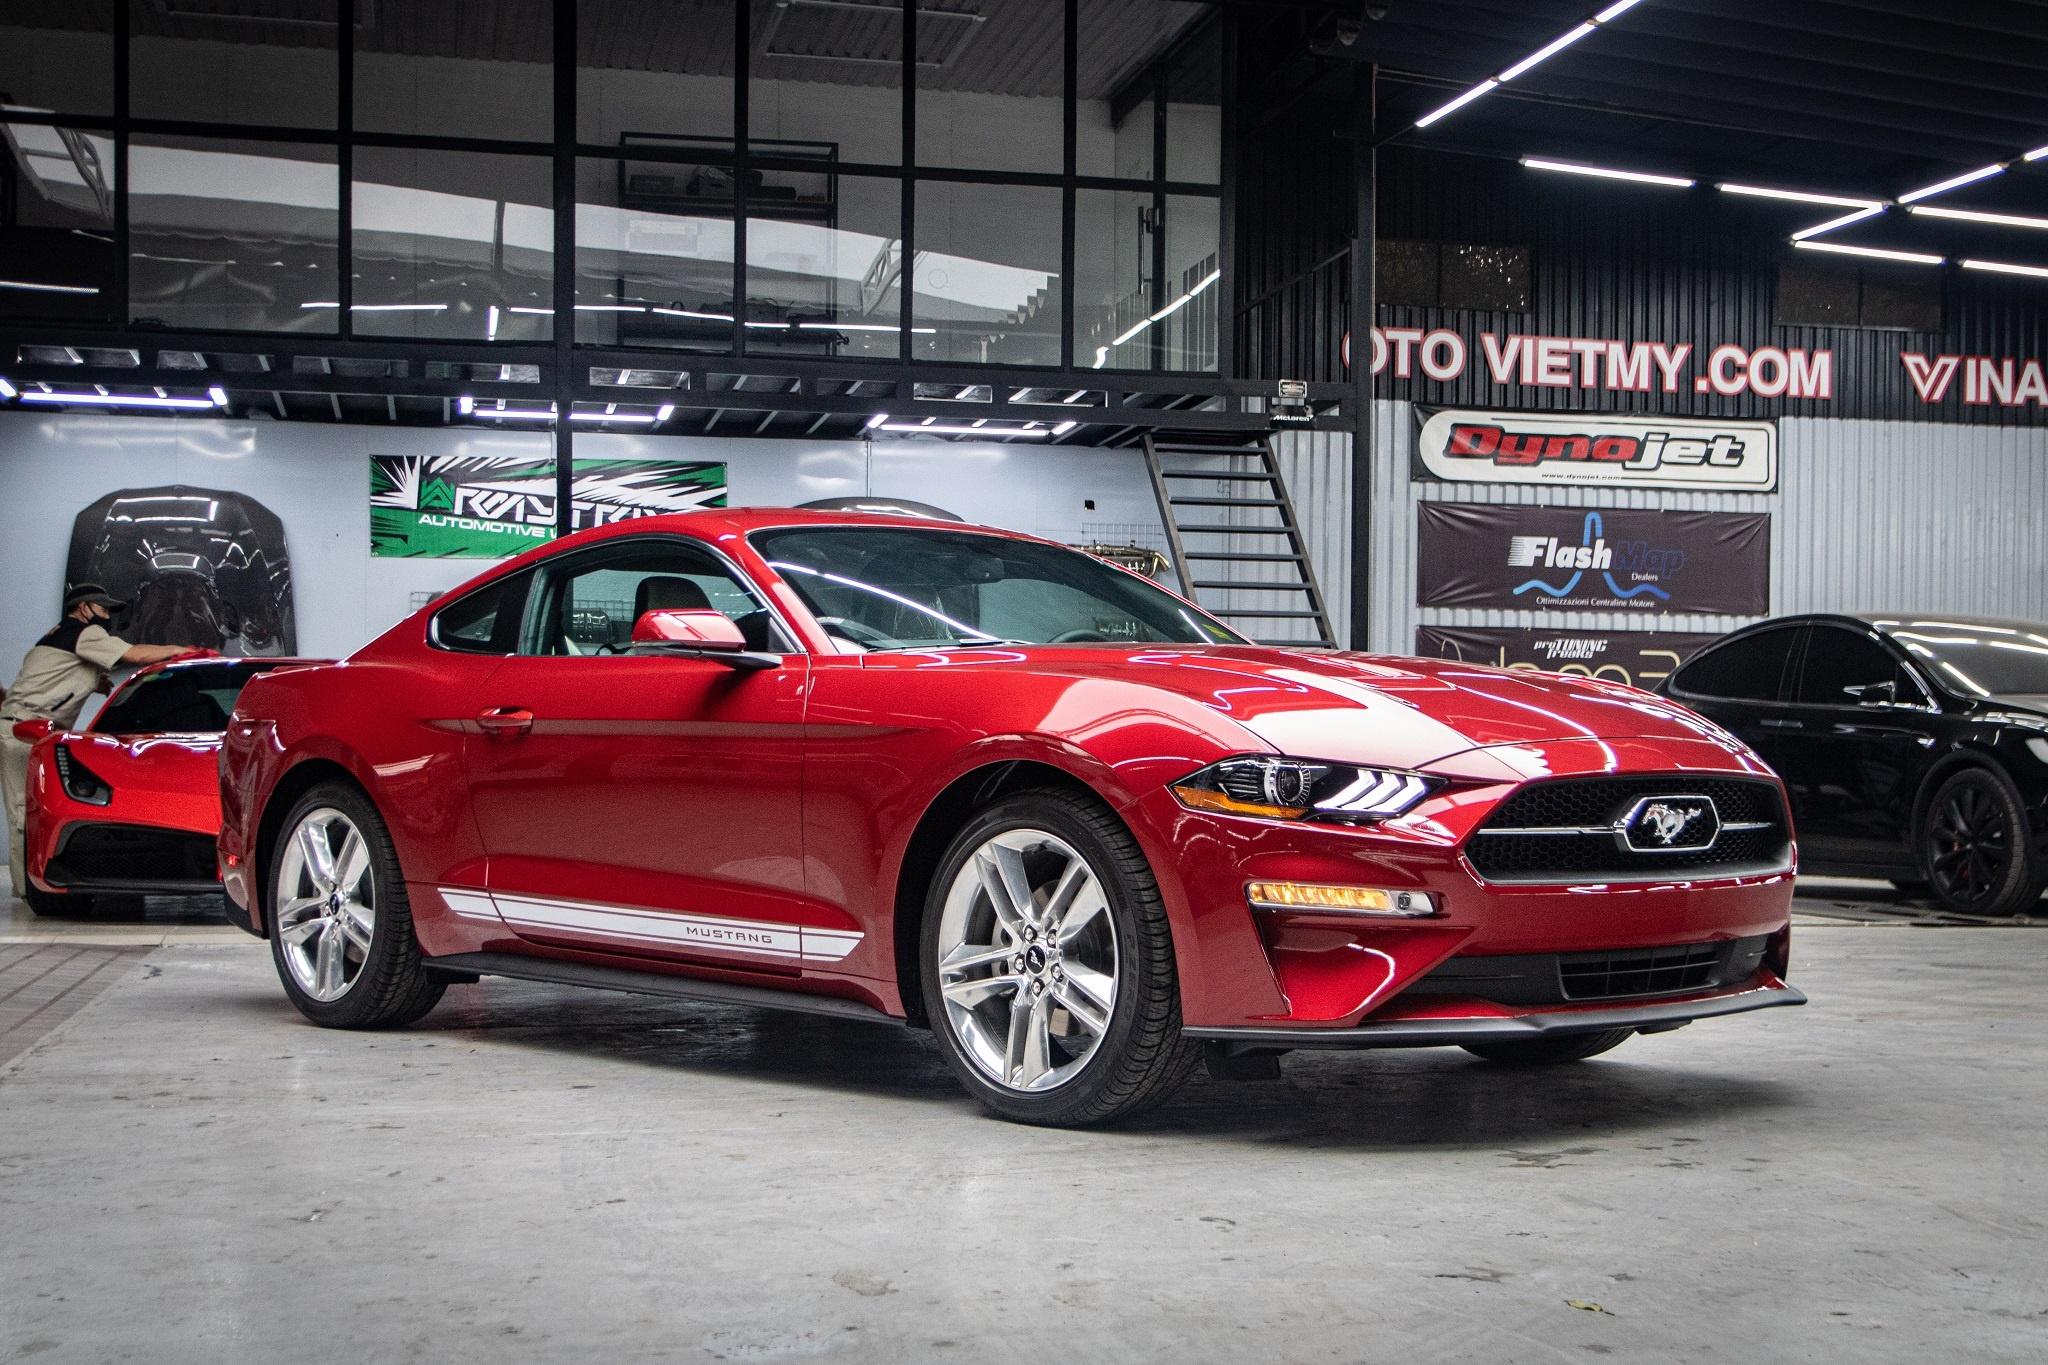 Ford Mustang 2020 phien ban ky niem vua ve VN, gia hon 3 ty hinh anh 2 Mustang_55_edition_zing_27_.jpg